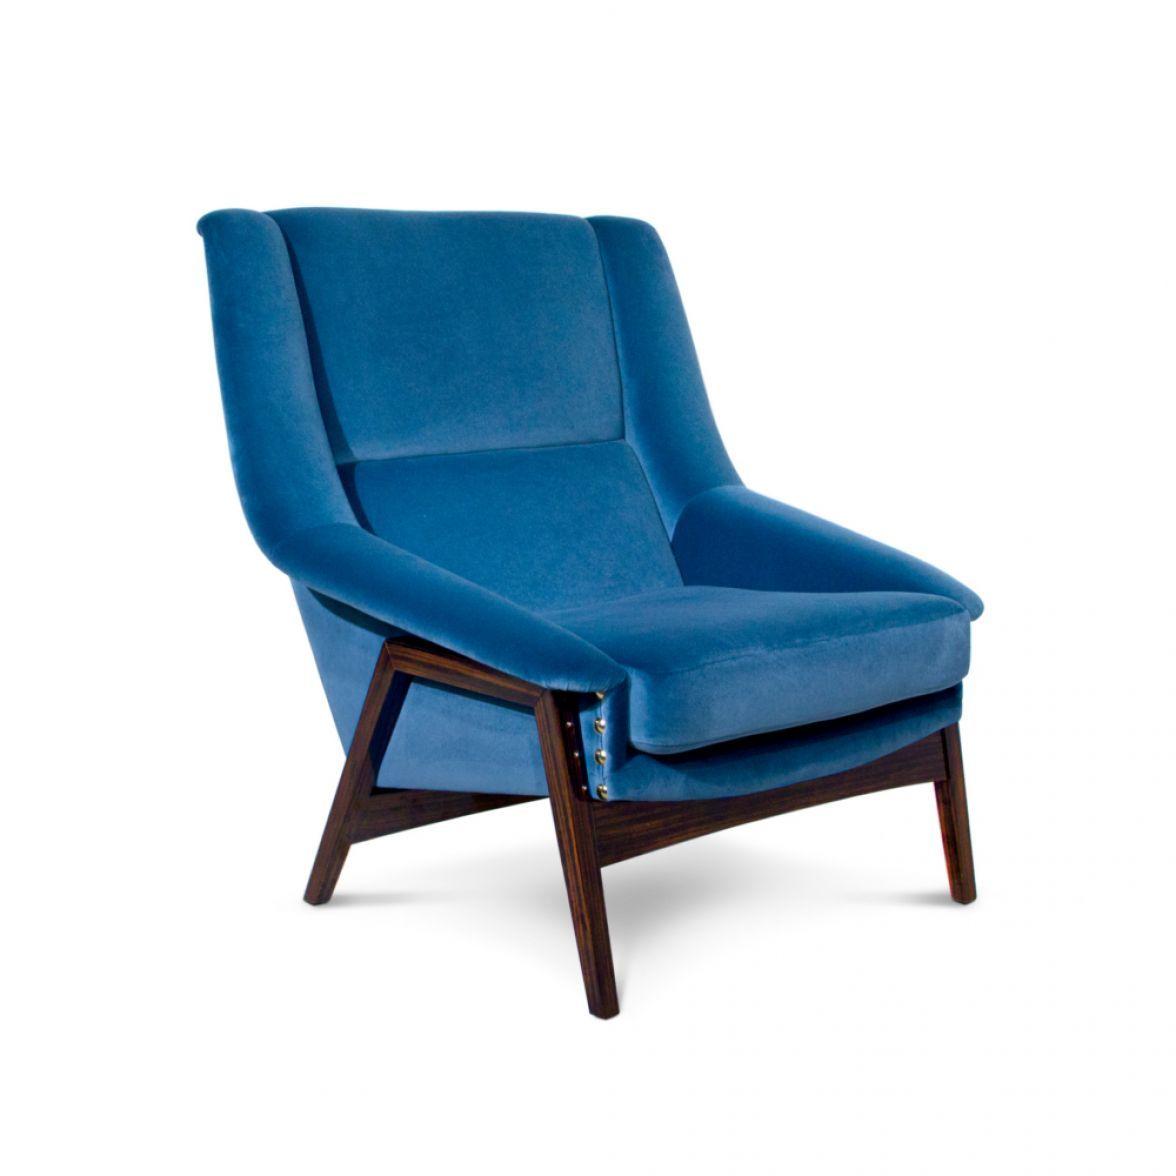 Inca armchair фото цена